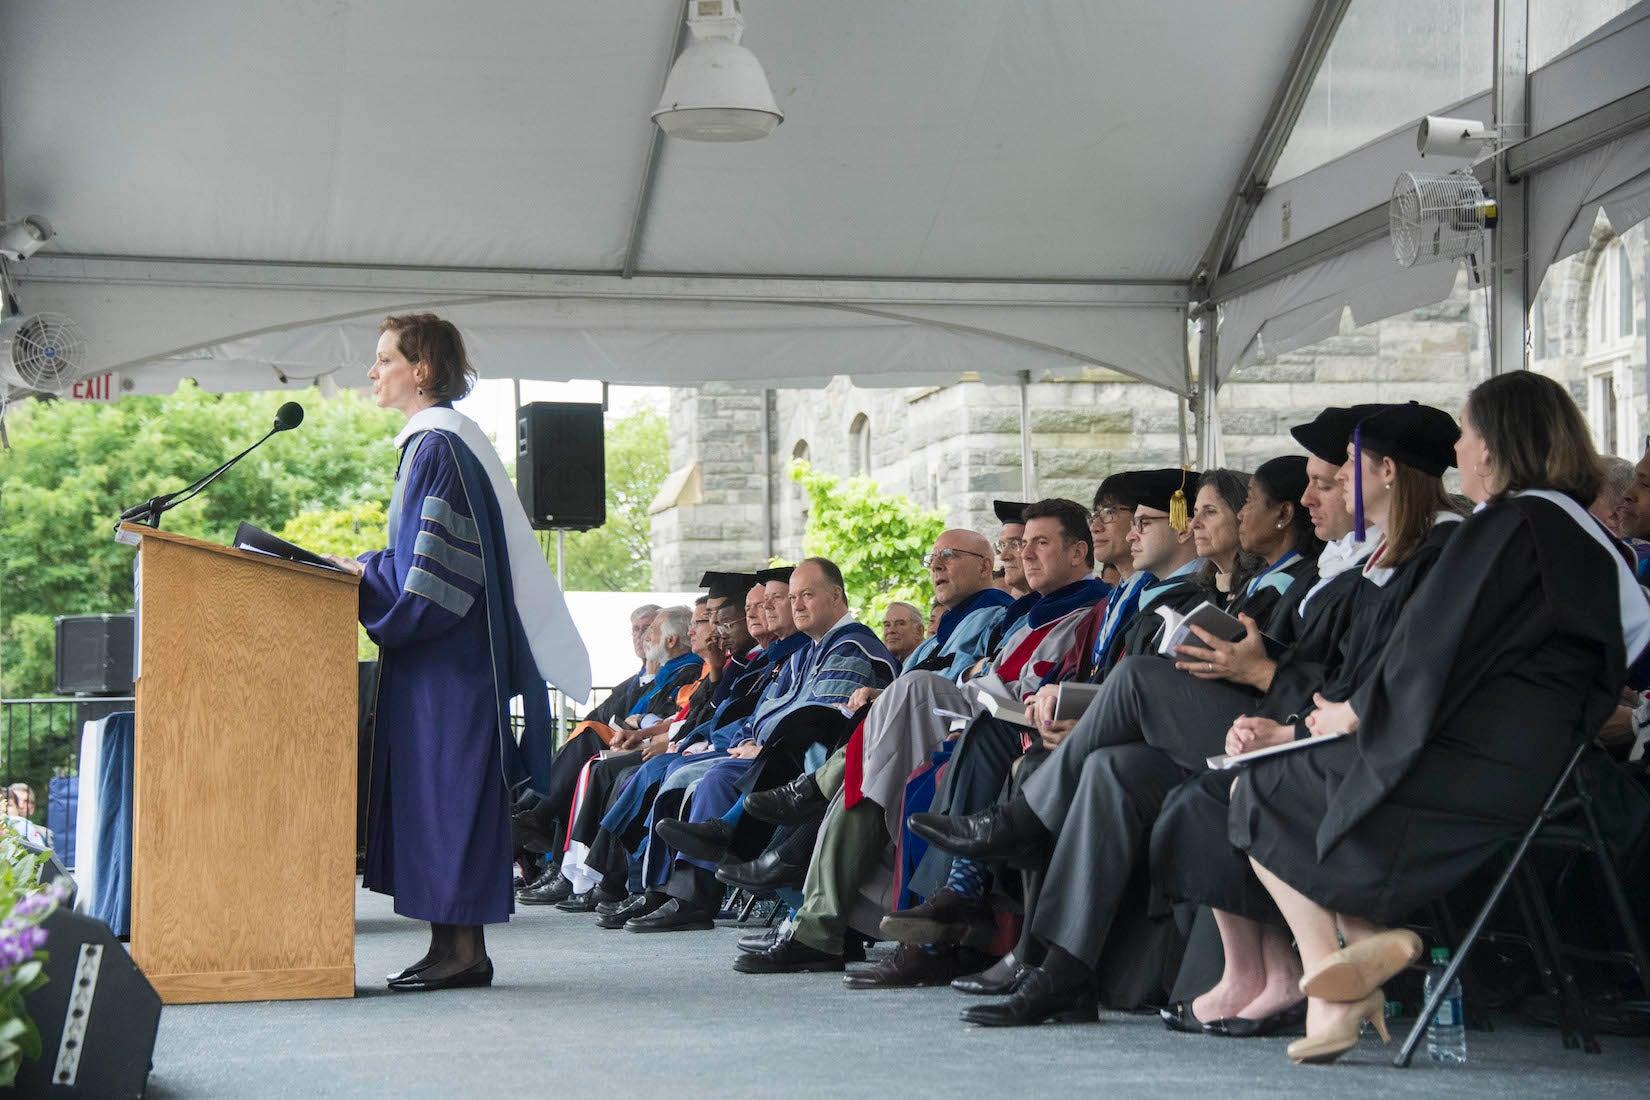 Anne Applebaum addresses SFS graduates.